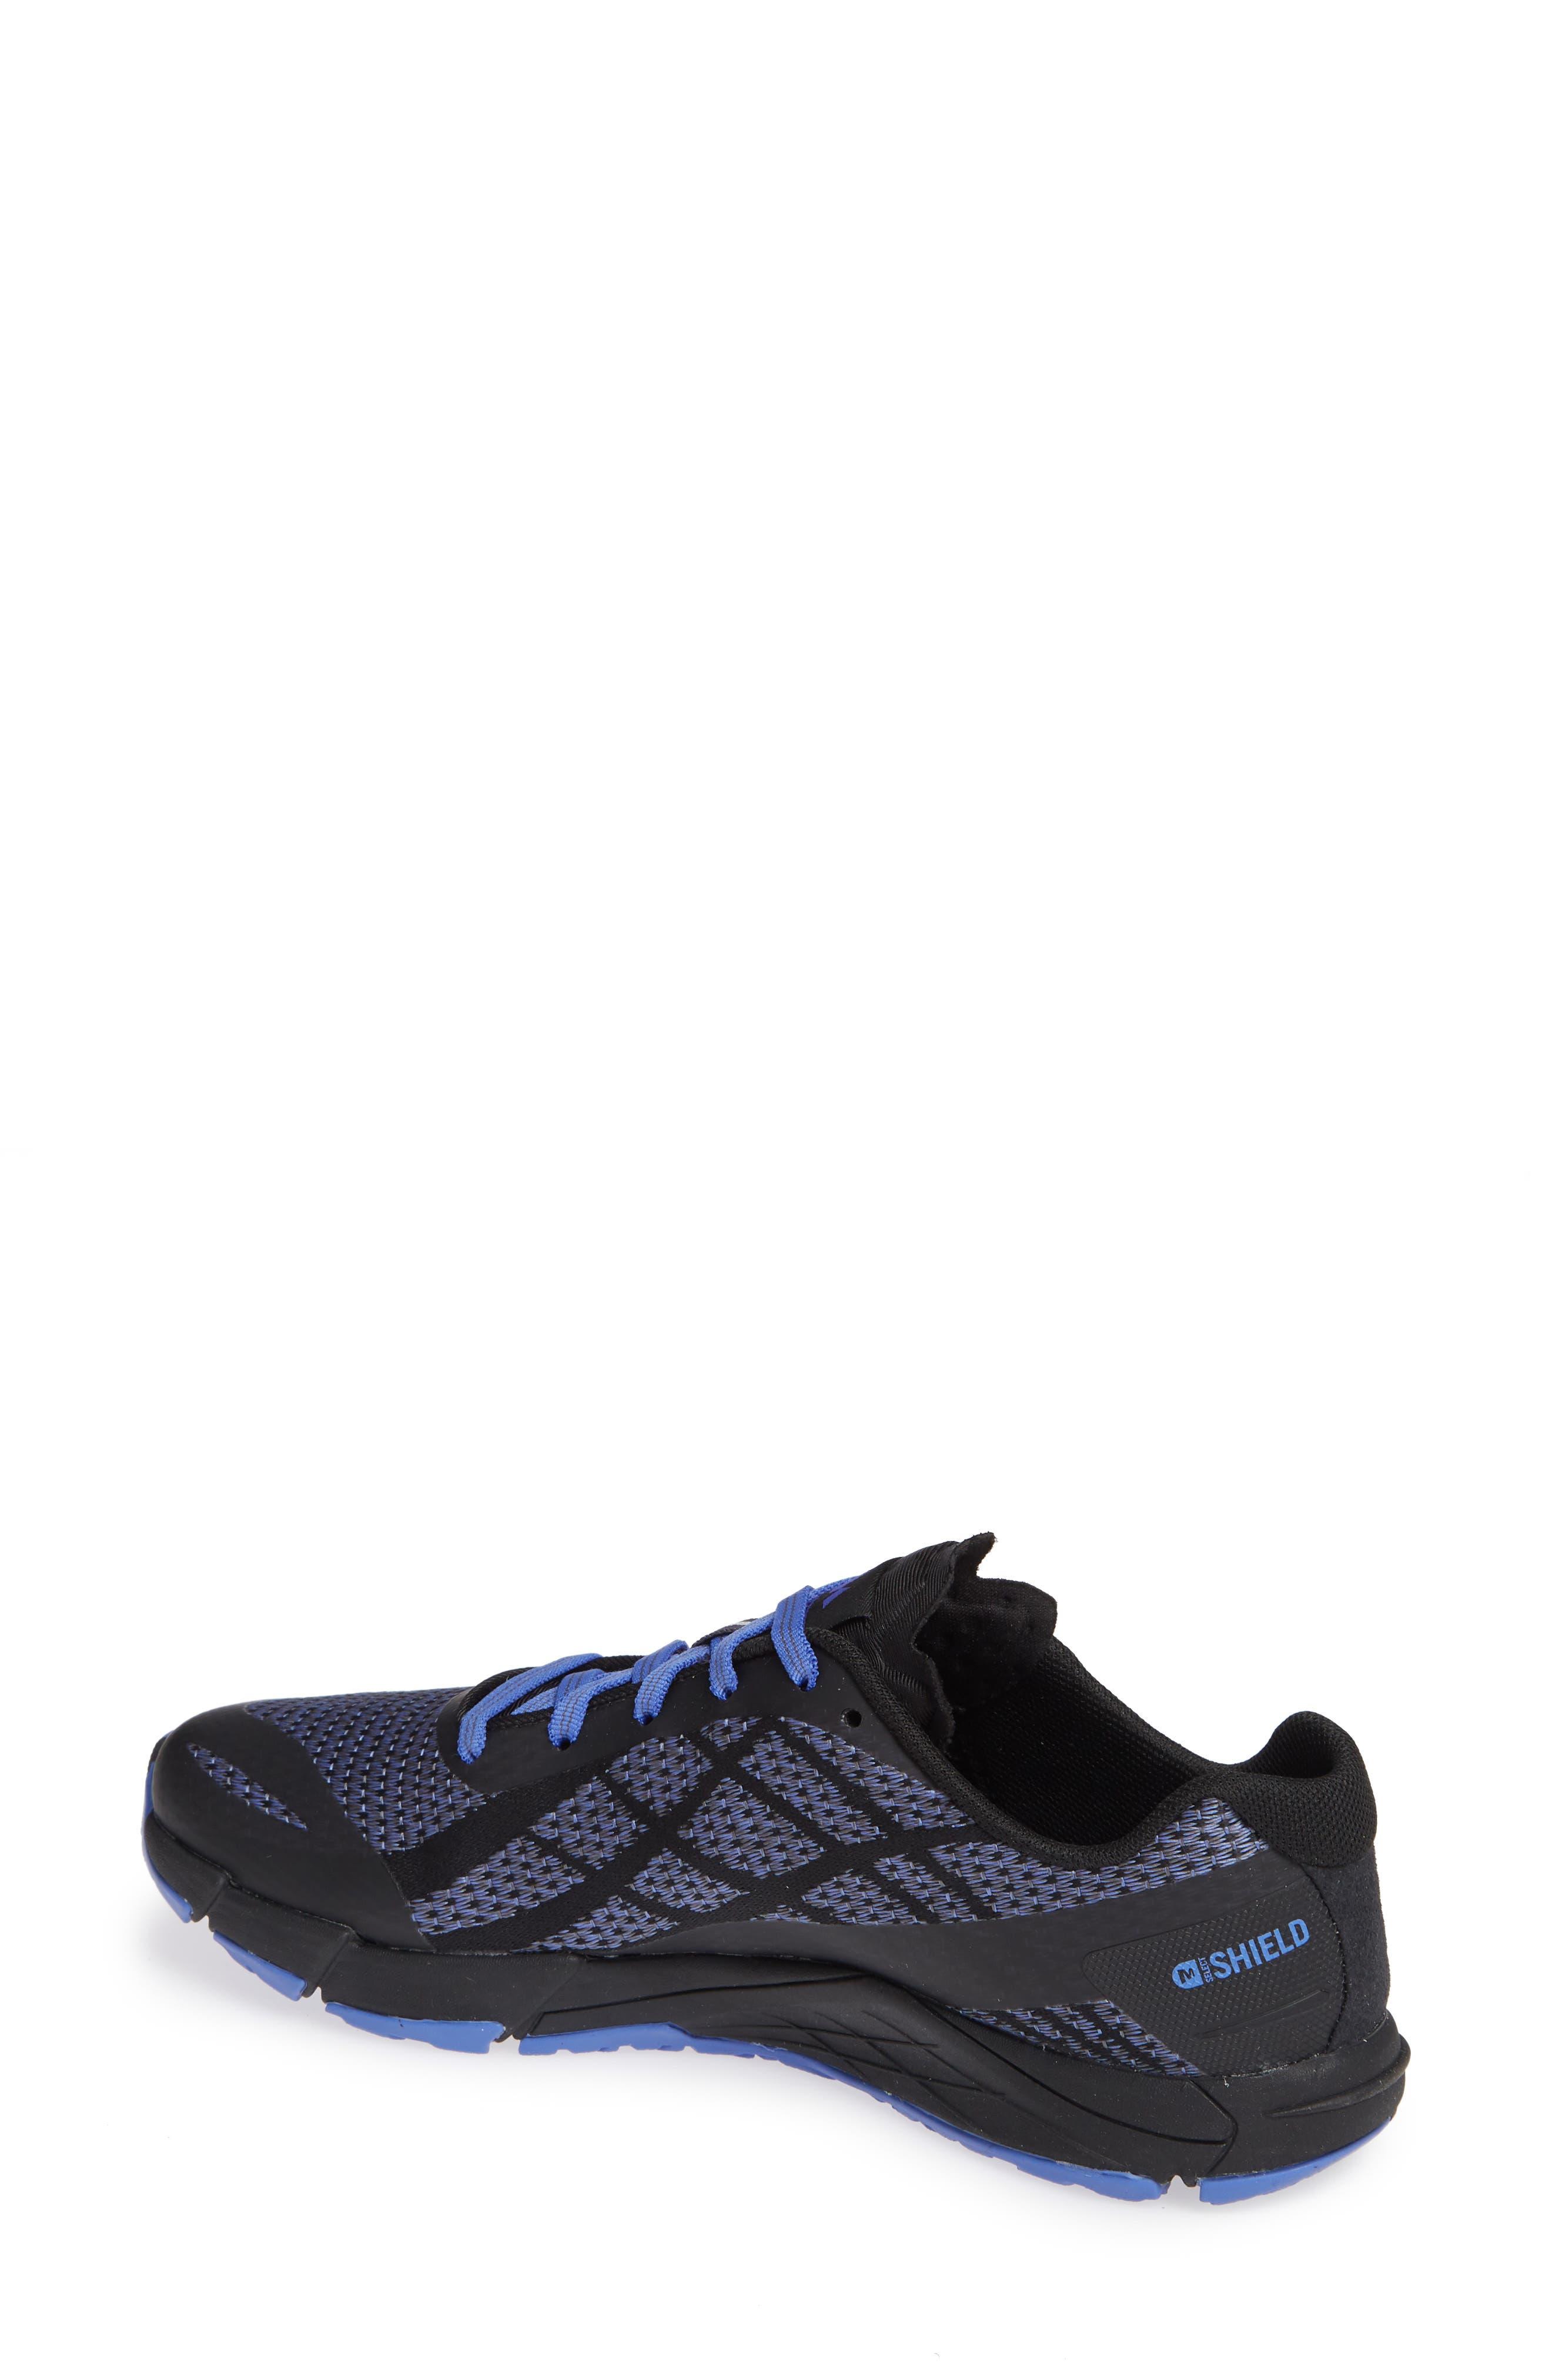 MERRELL, Bare Access Flex Shield Lace-Up Sneaker, Alternate thumbnail 2, color, 001